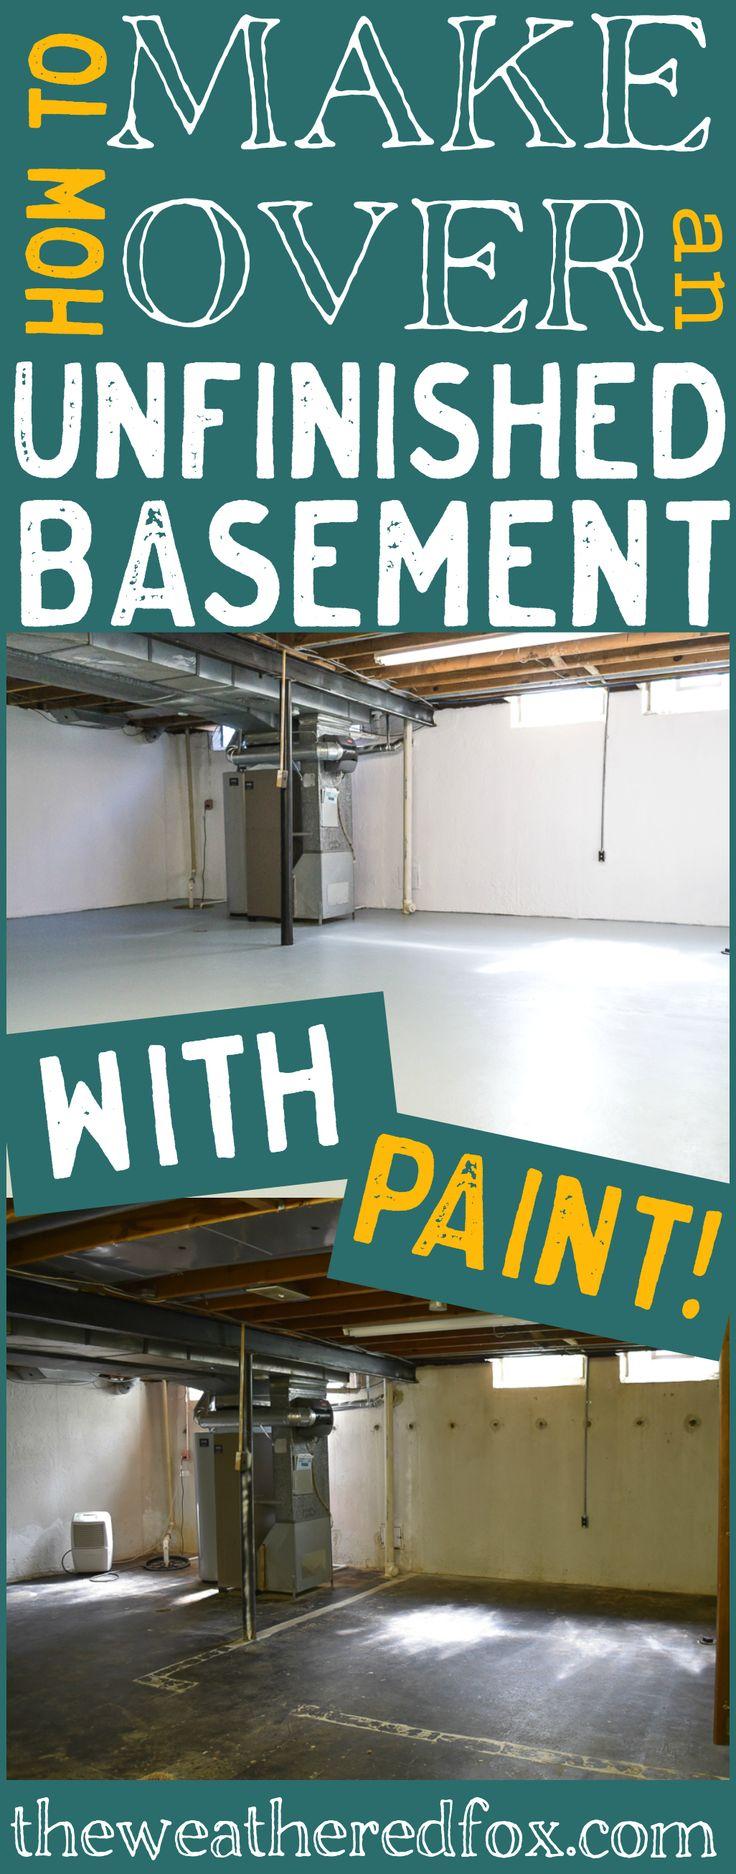 Best Ideas About Unfinished Basement Laundry On Pinterest - Unfinished basement laundry room ideas